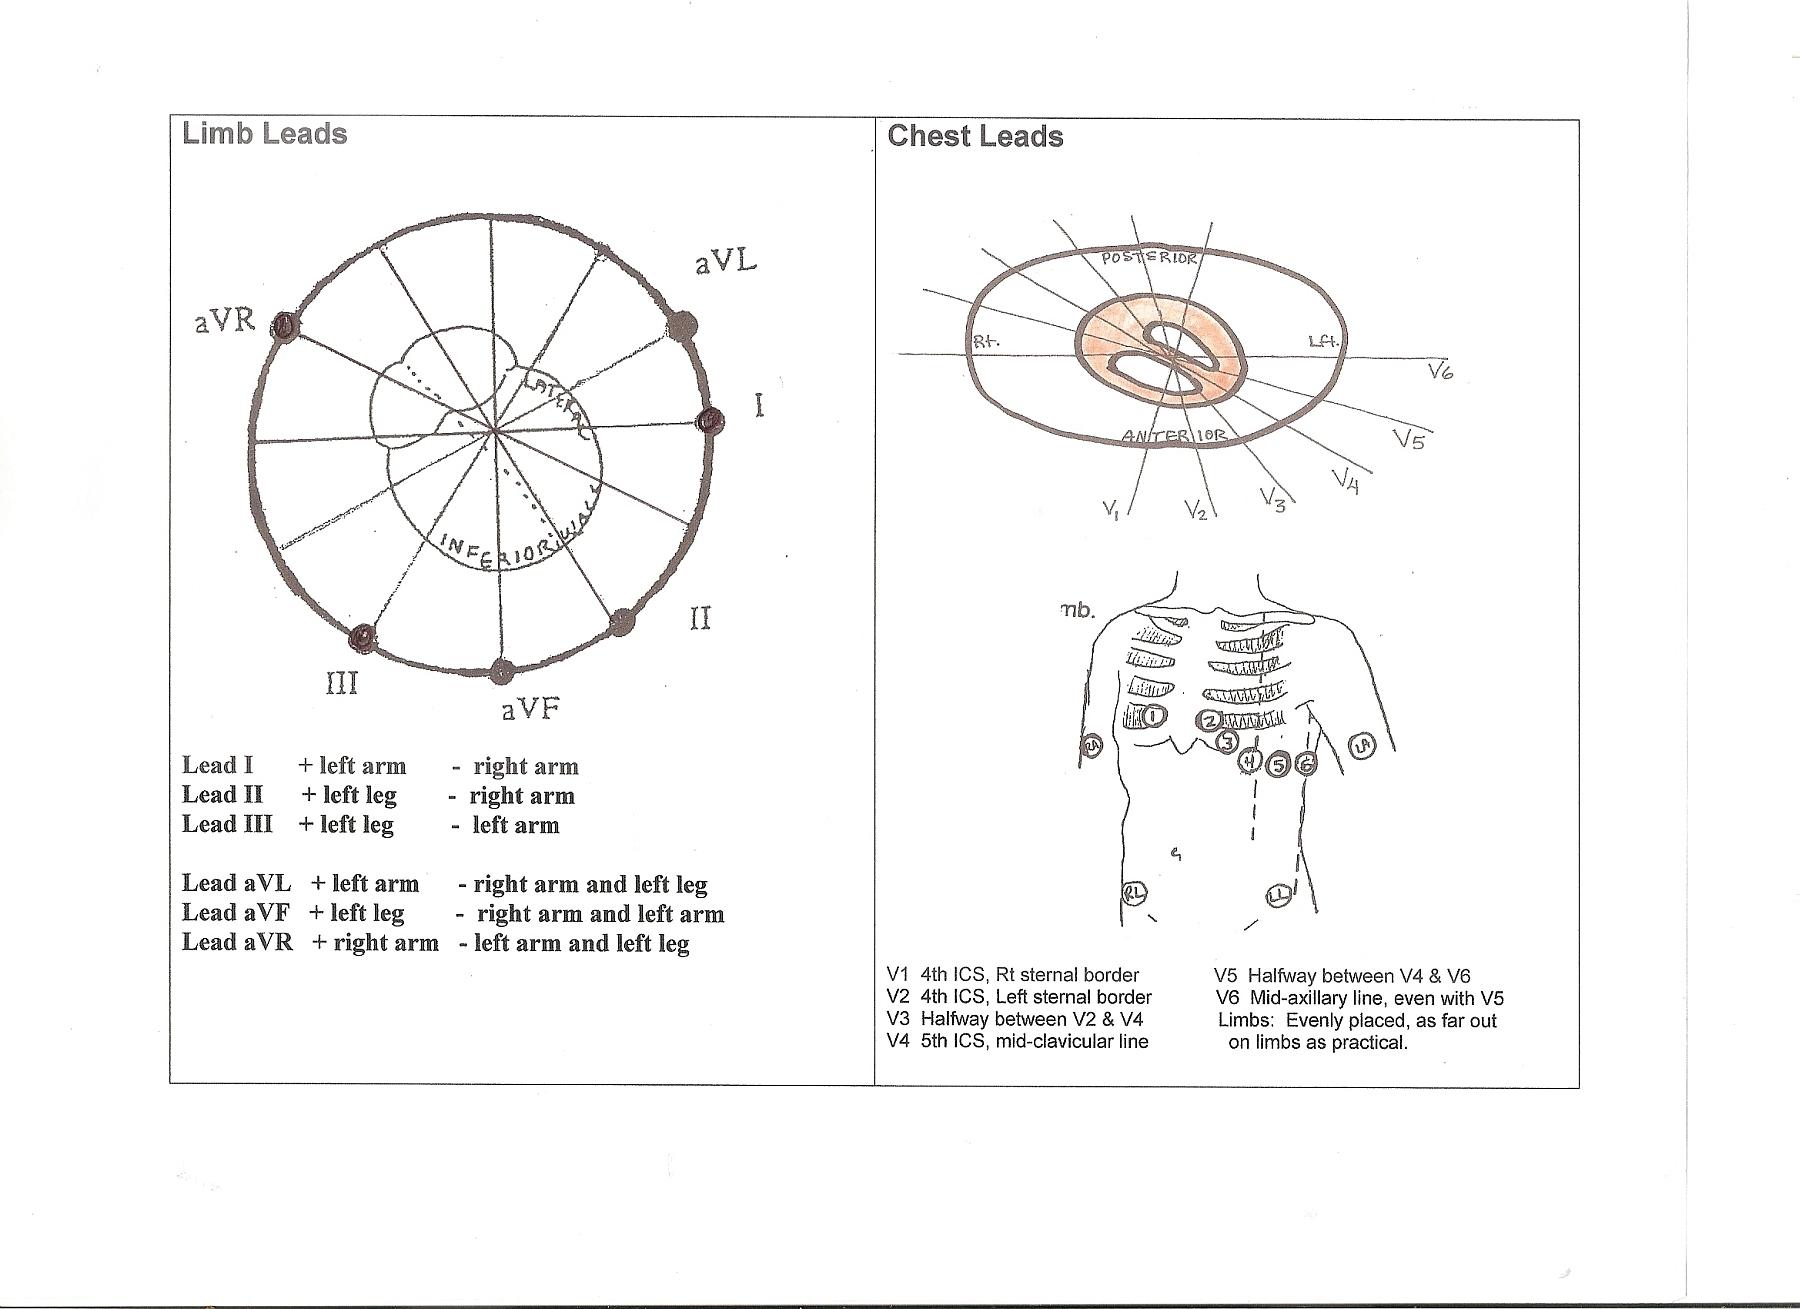 Diagram Of Frontal Amp Horizontal Plane Leads Ecg Guru